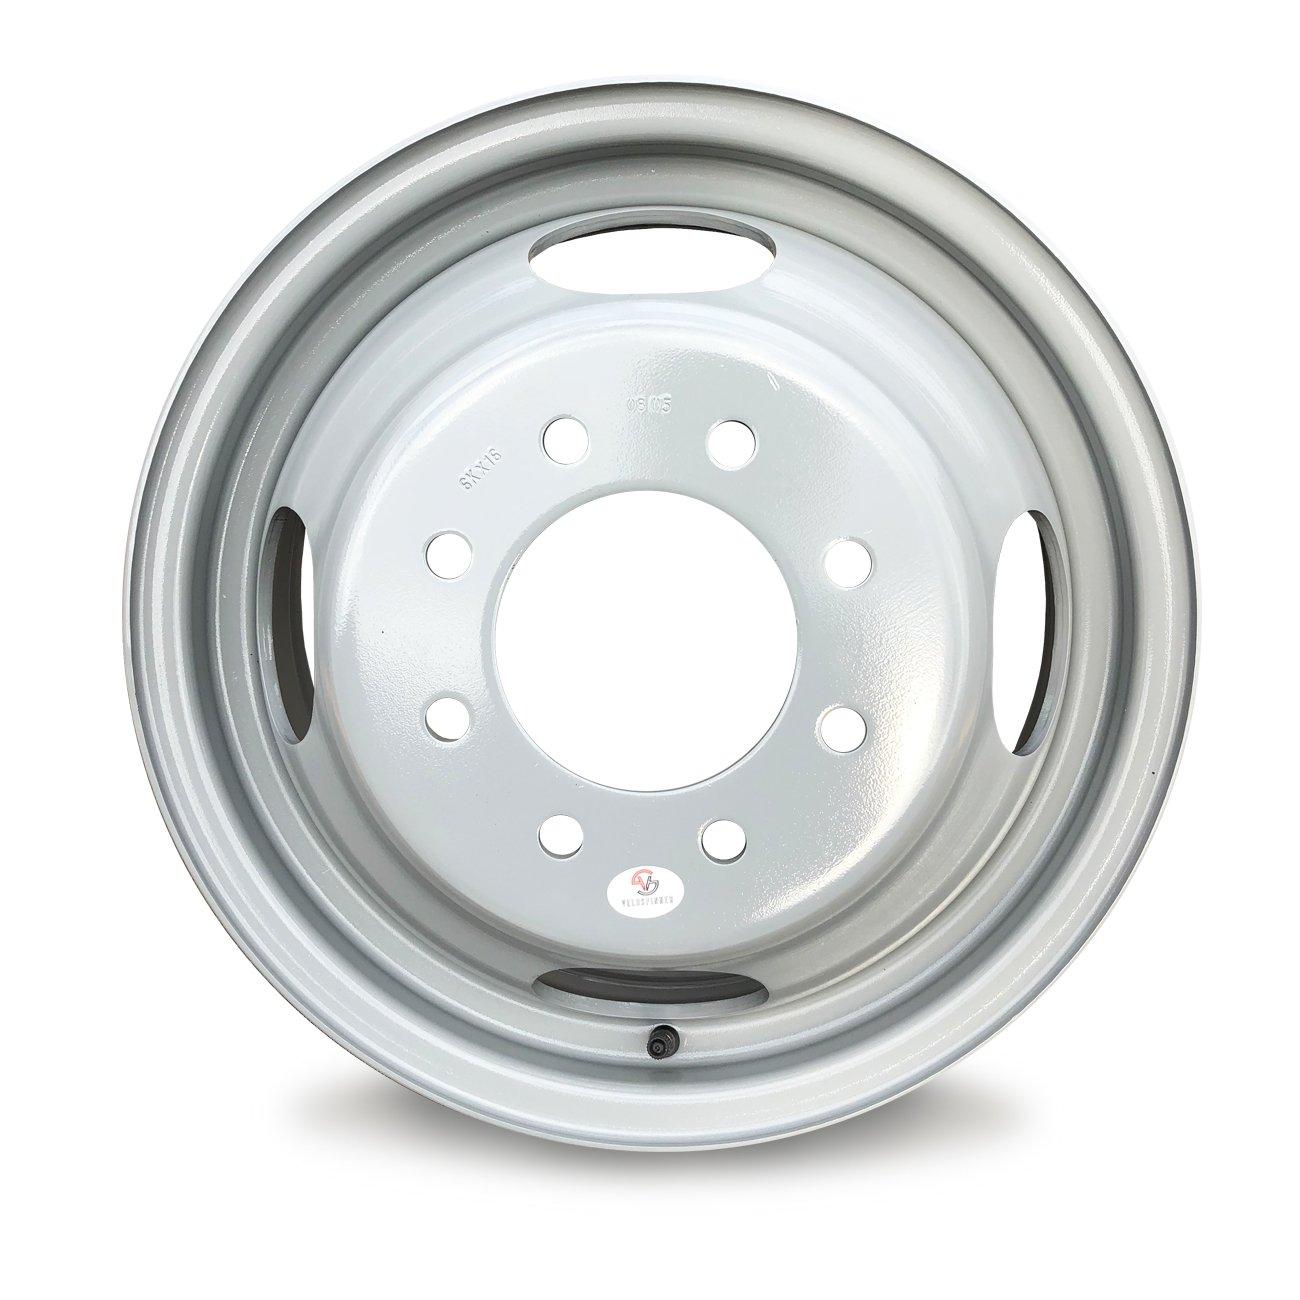 NEW 16X6 INCH GMC 1988-2000 3500 Super Duty Dually Steel Wheel Rim OEM Quality 1620